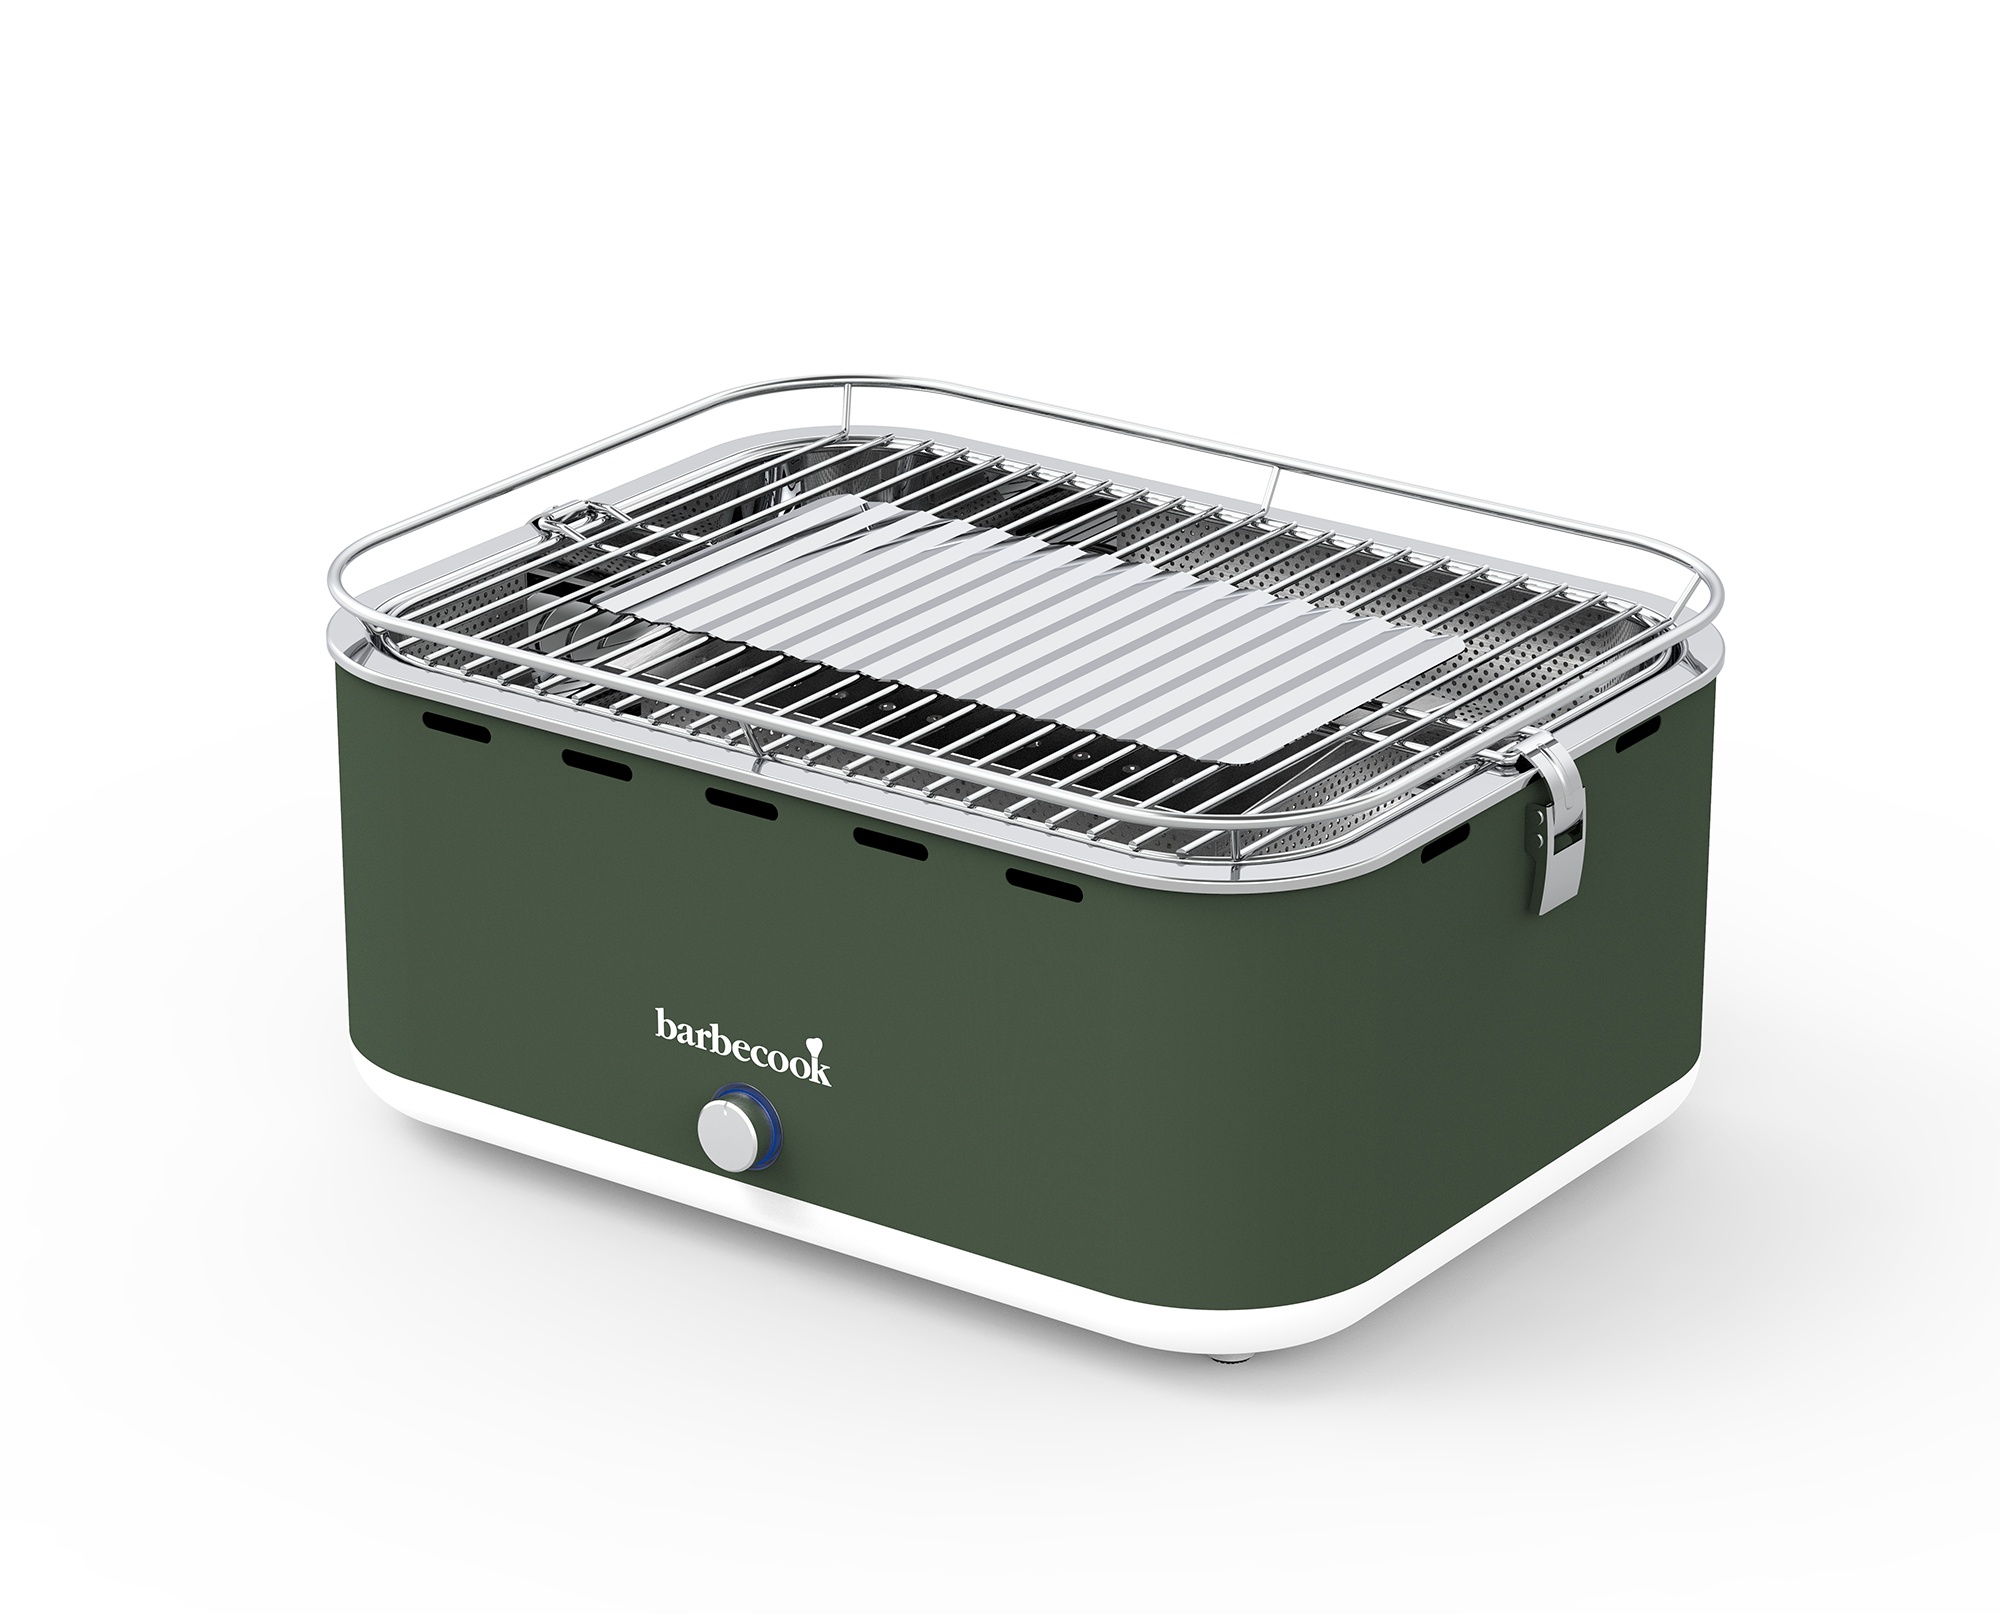 Barbecook Carlo - Army Green